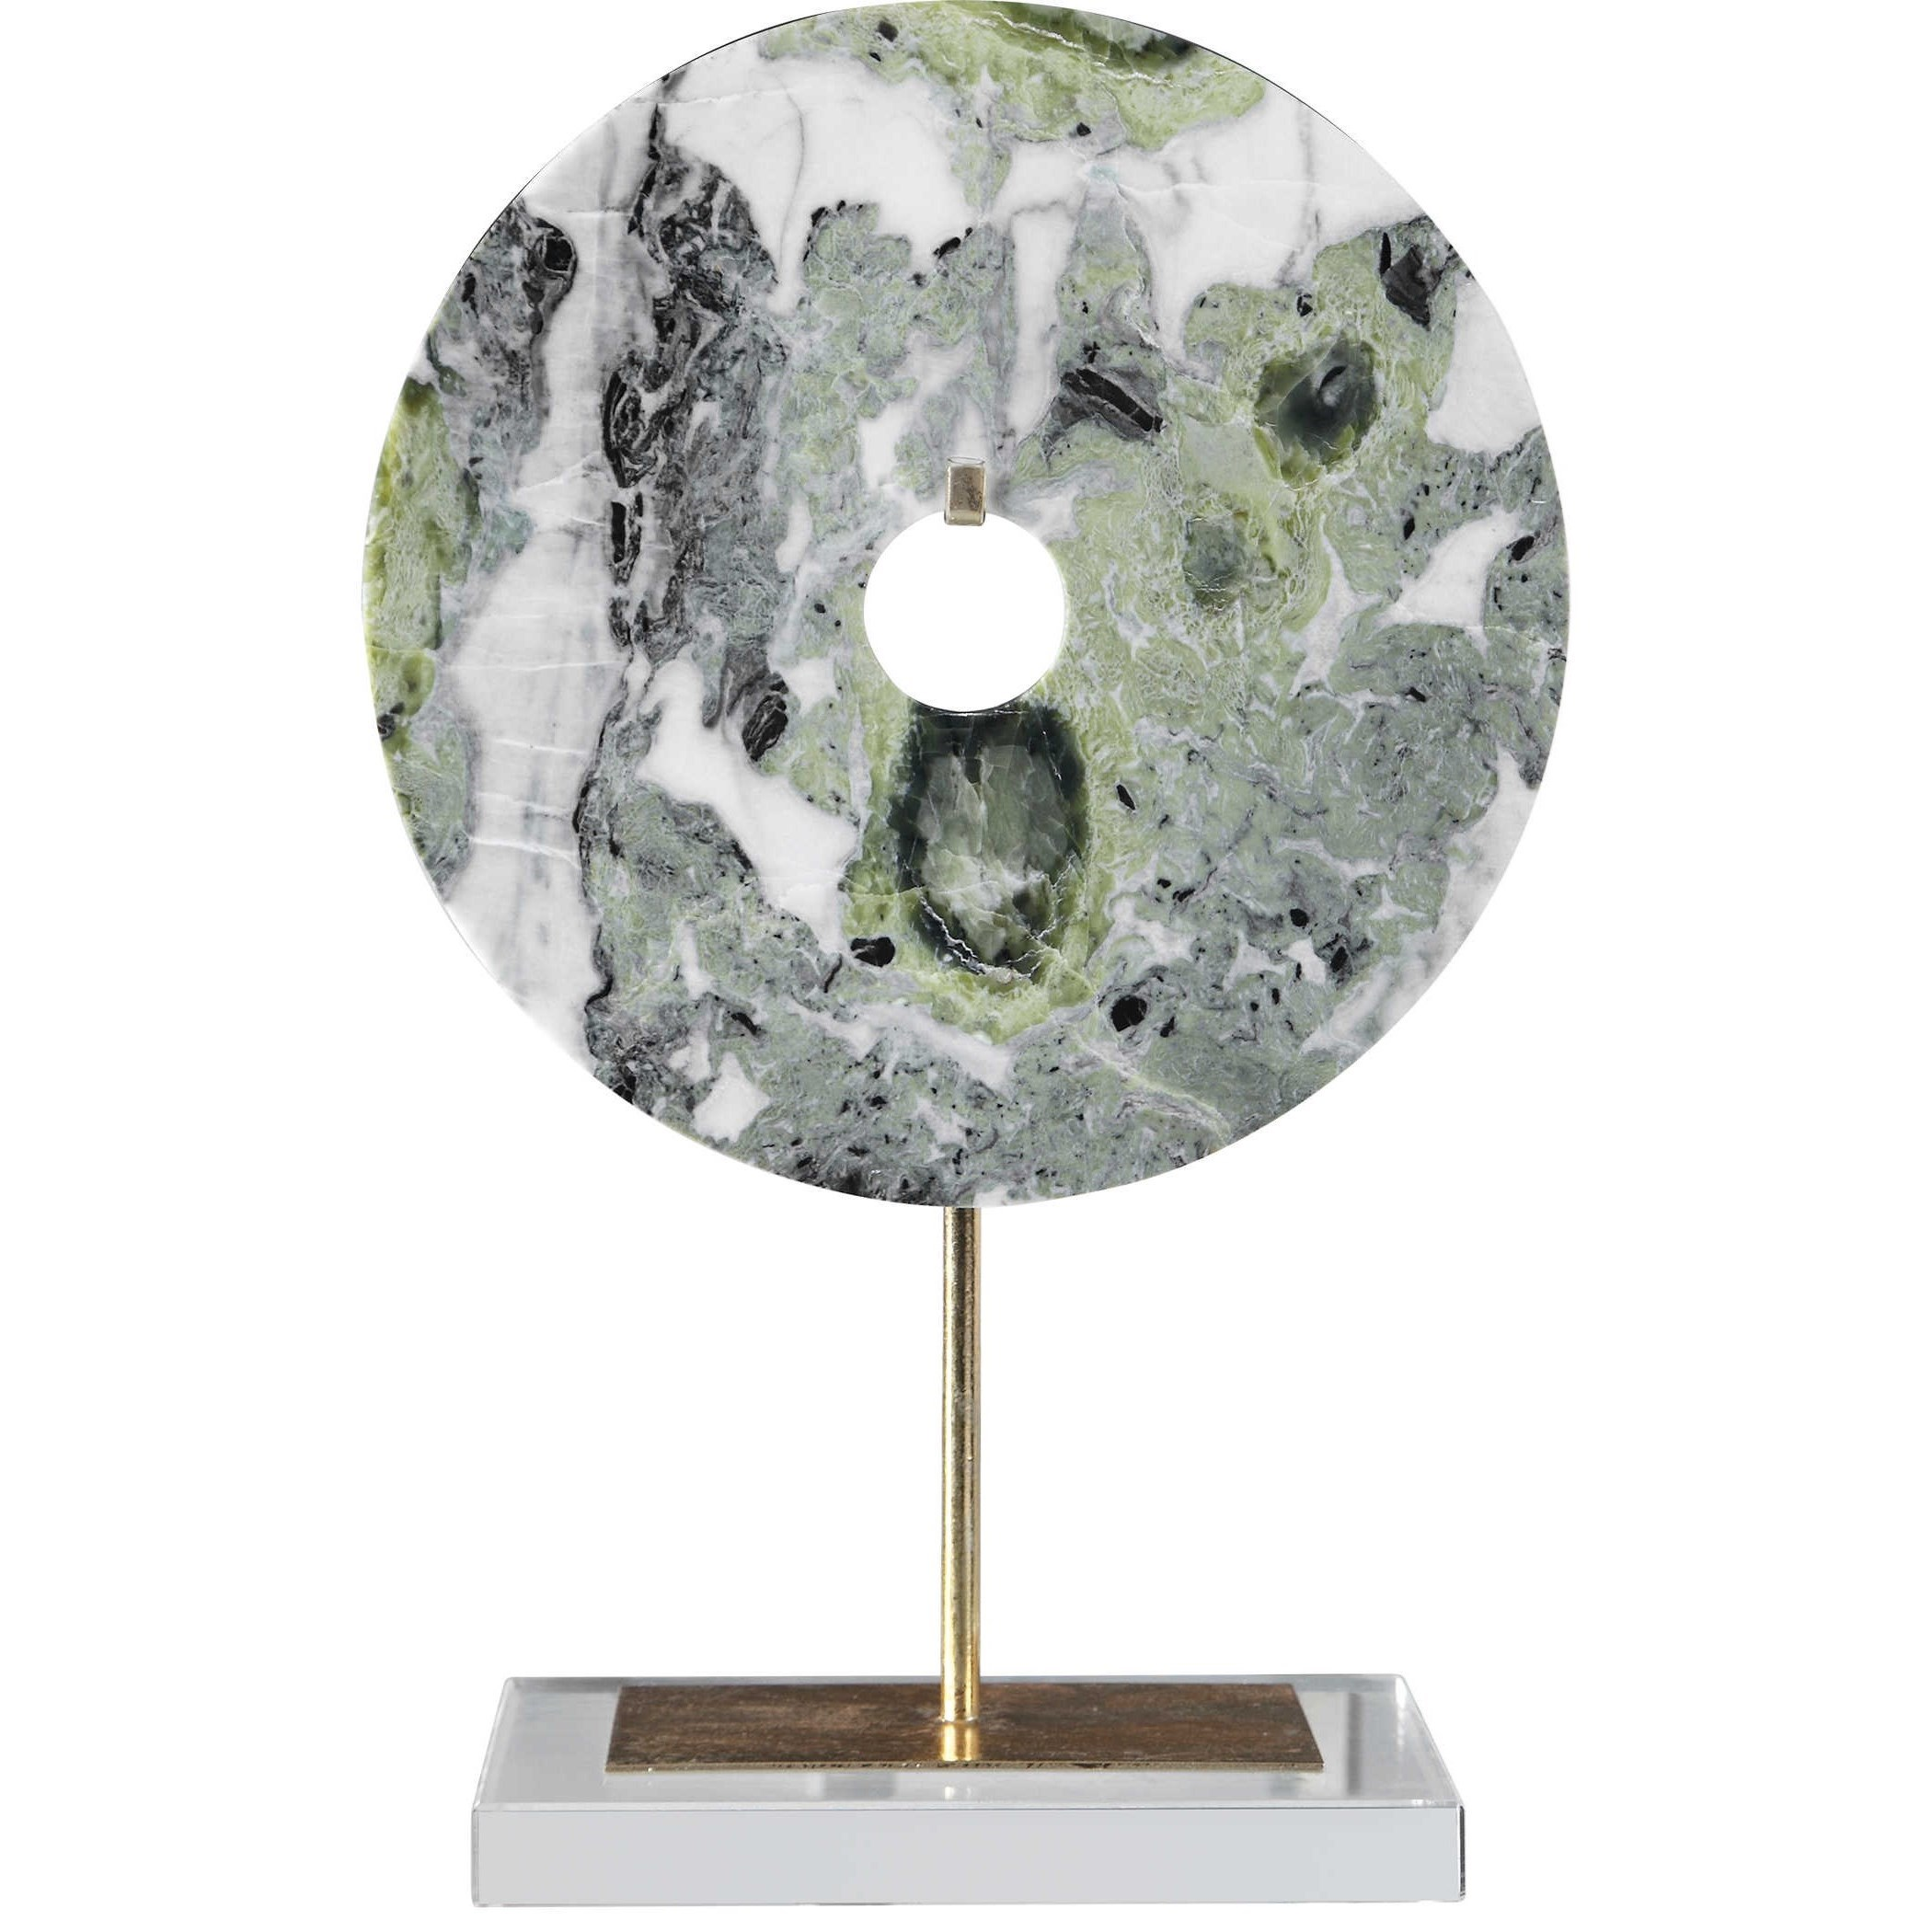 Irelyn Marble Disk Sculpture